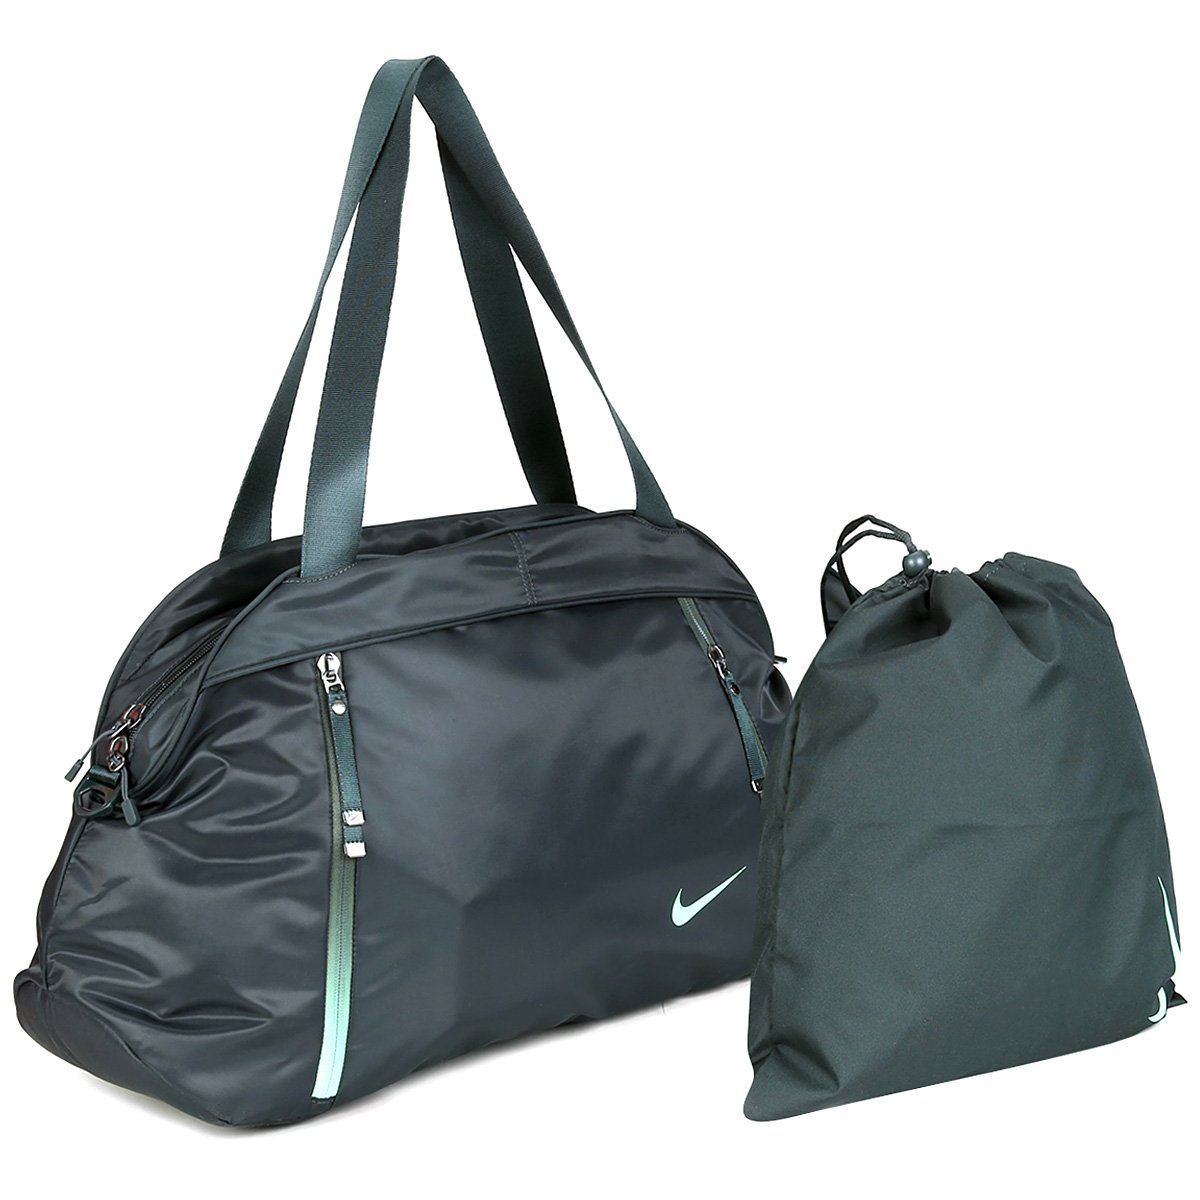 Verde Auralux Club Bolsa E Nike Feminina Preto Y7v6gbyf